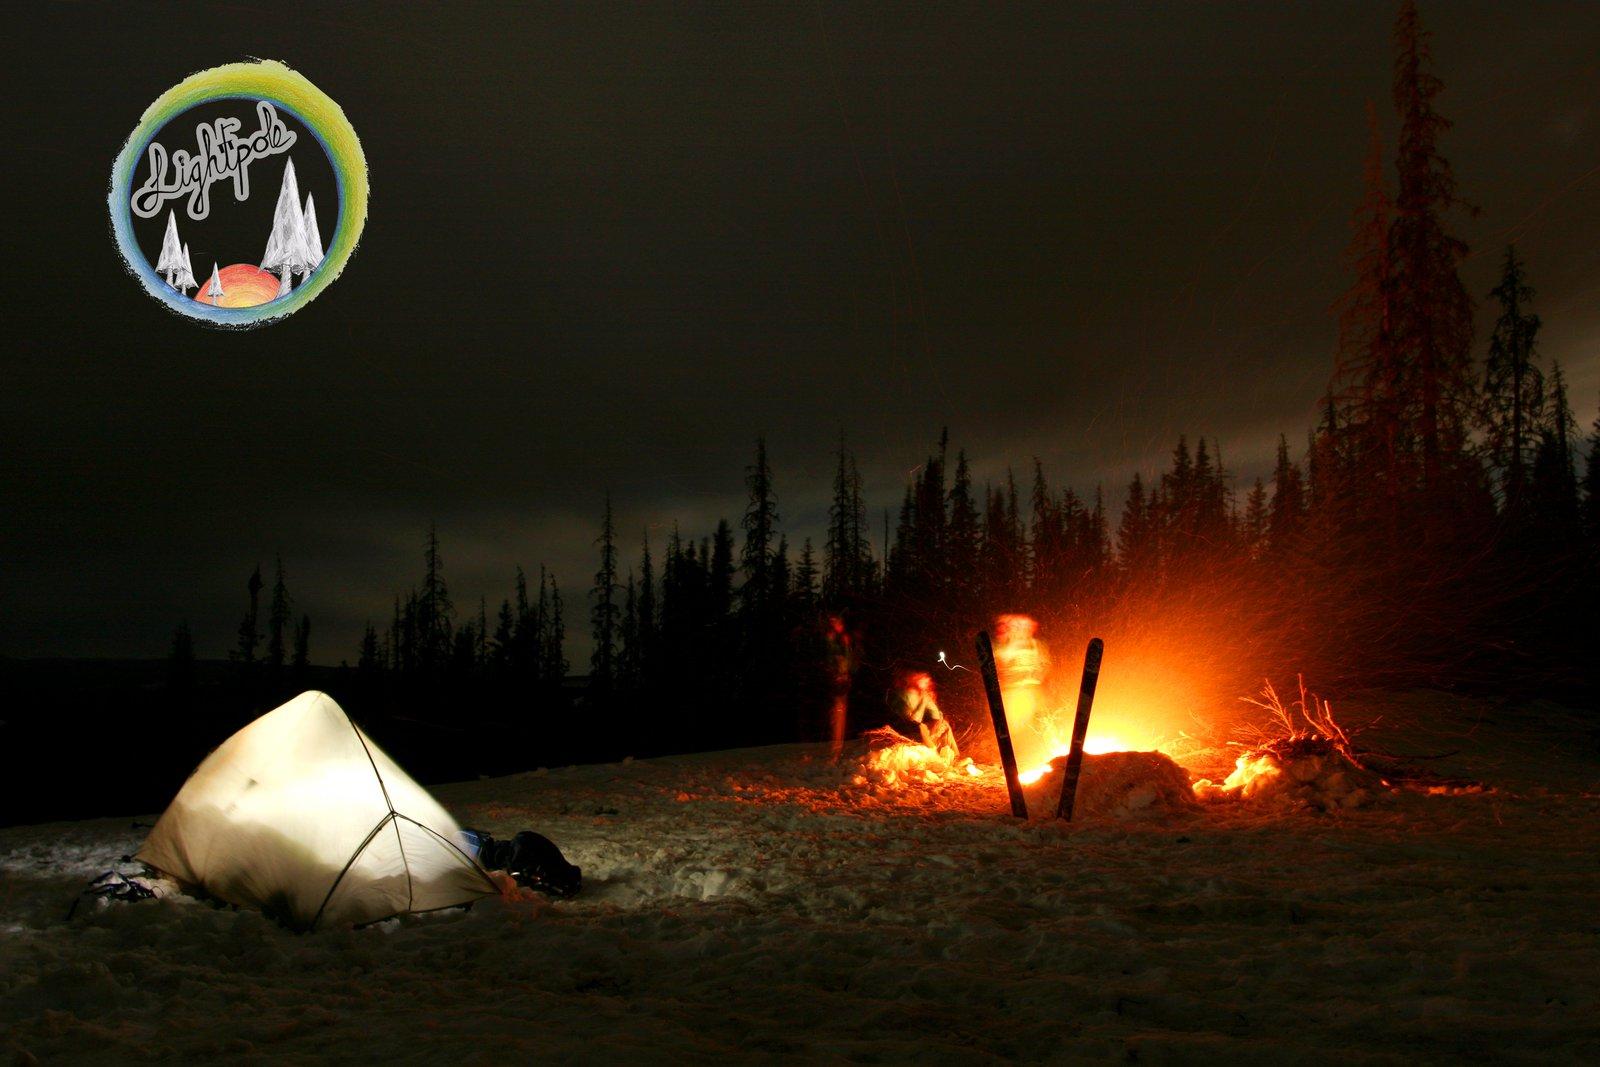 Camping @ Rabbit Ears